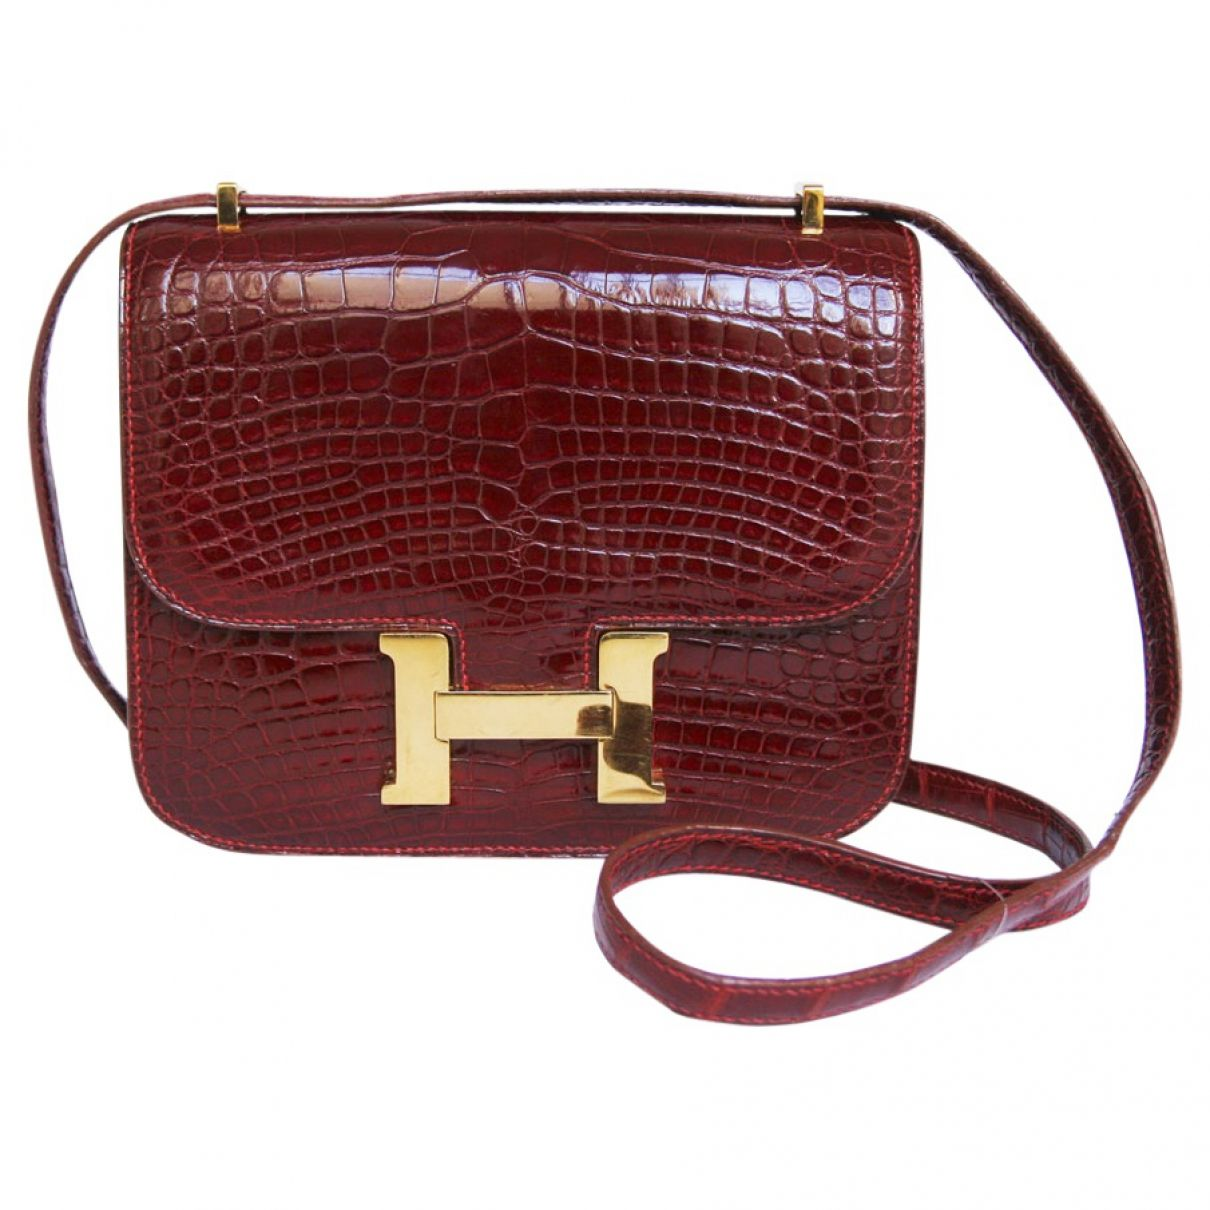 Hermès Constance Alligator Bag  11d31fd54081e